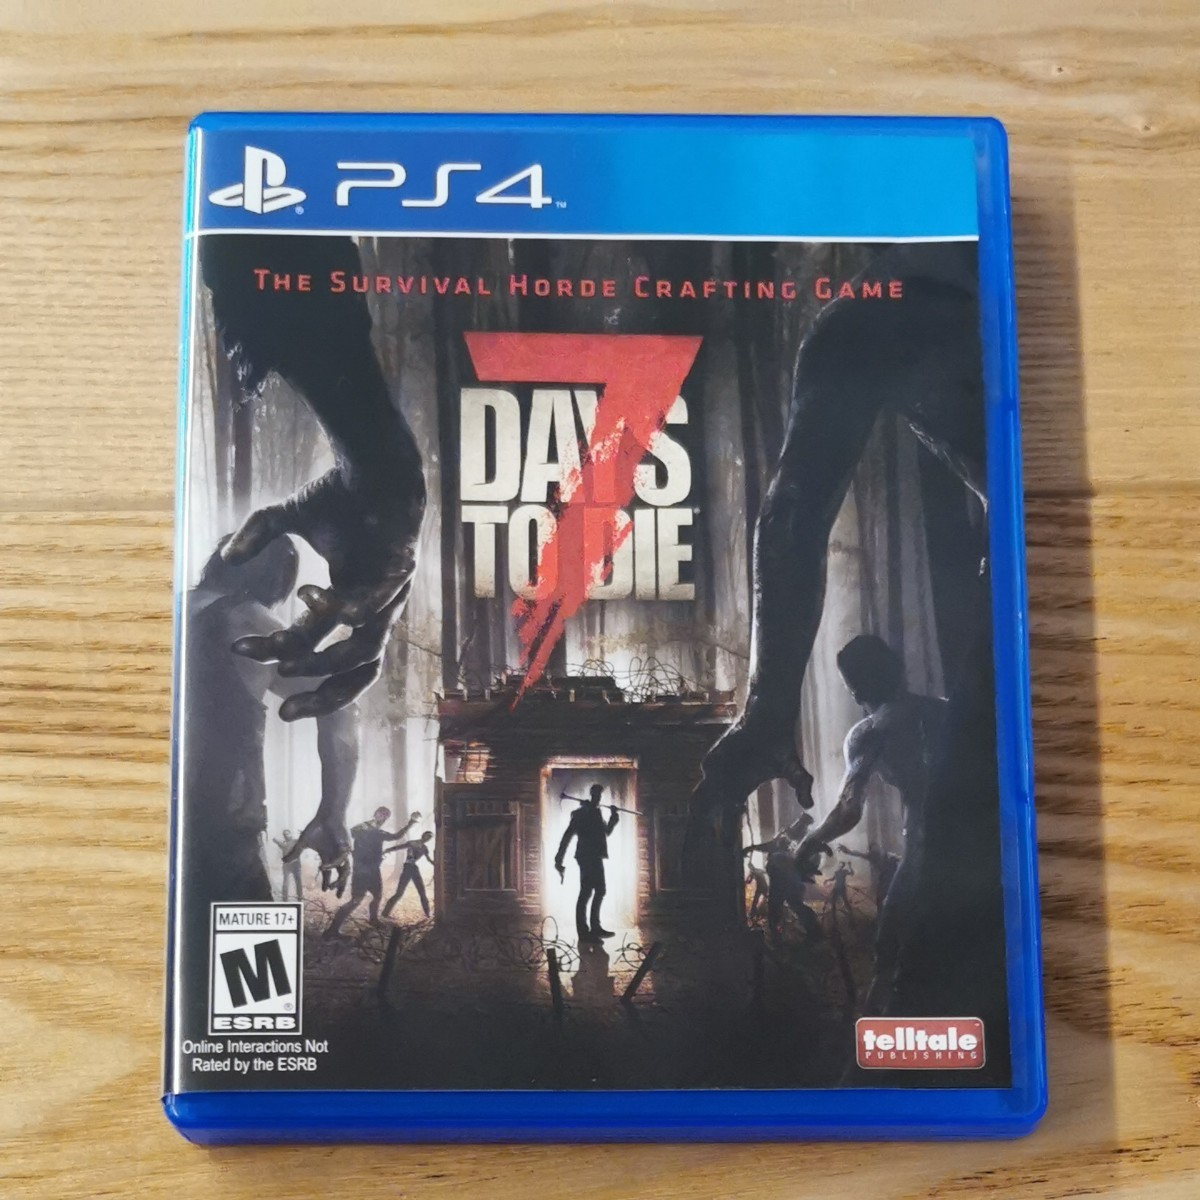 北米版 海外版 PS4 7days to die